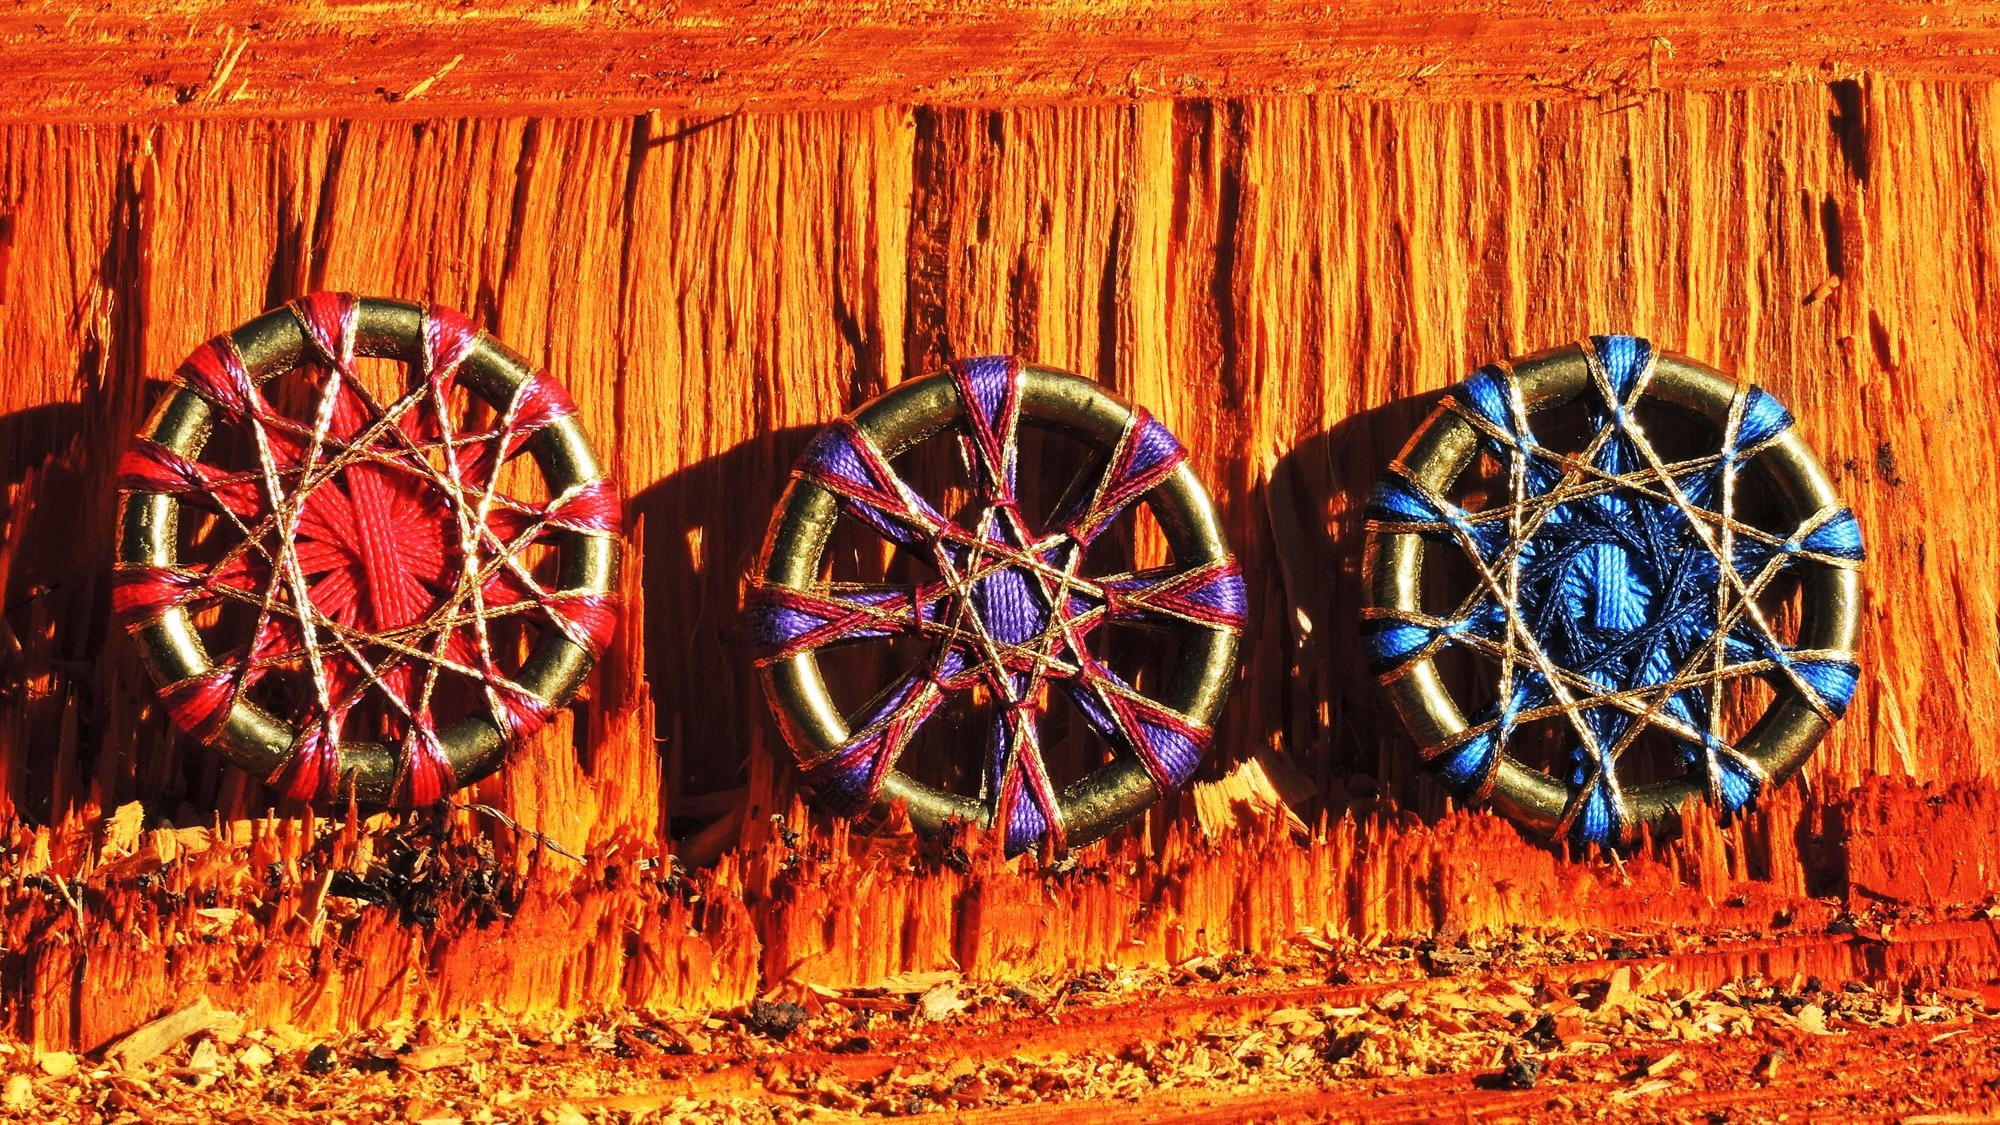 3 Zwirnknopf-Anhänger | Ø  45 mm, Dicke 5 mm | Material: Messing, Baumwolle, Goldgarn